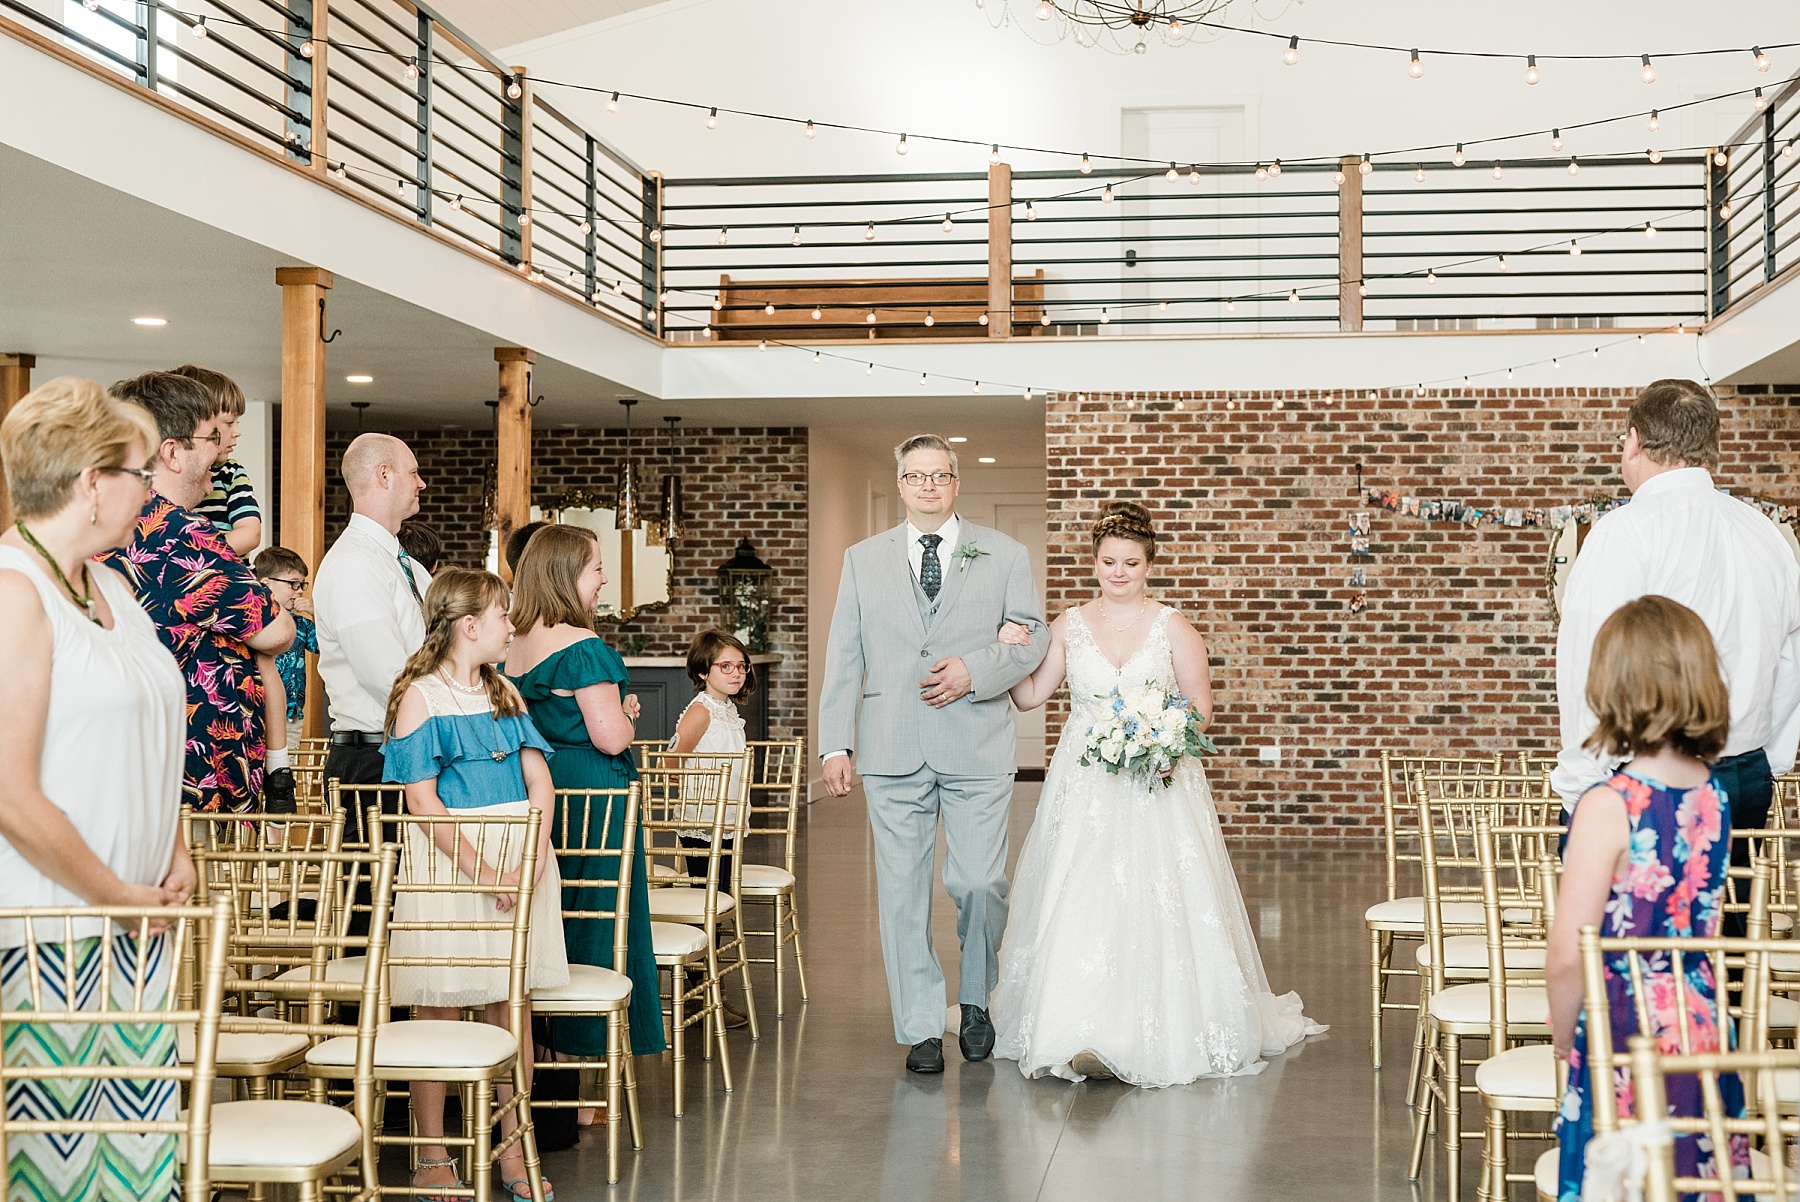 Intimate Summer Wedding at Emerson Fields by Kelsi Kliethermes Photography Best Missouri and Maui Wedding Photographer_0003.jpg